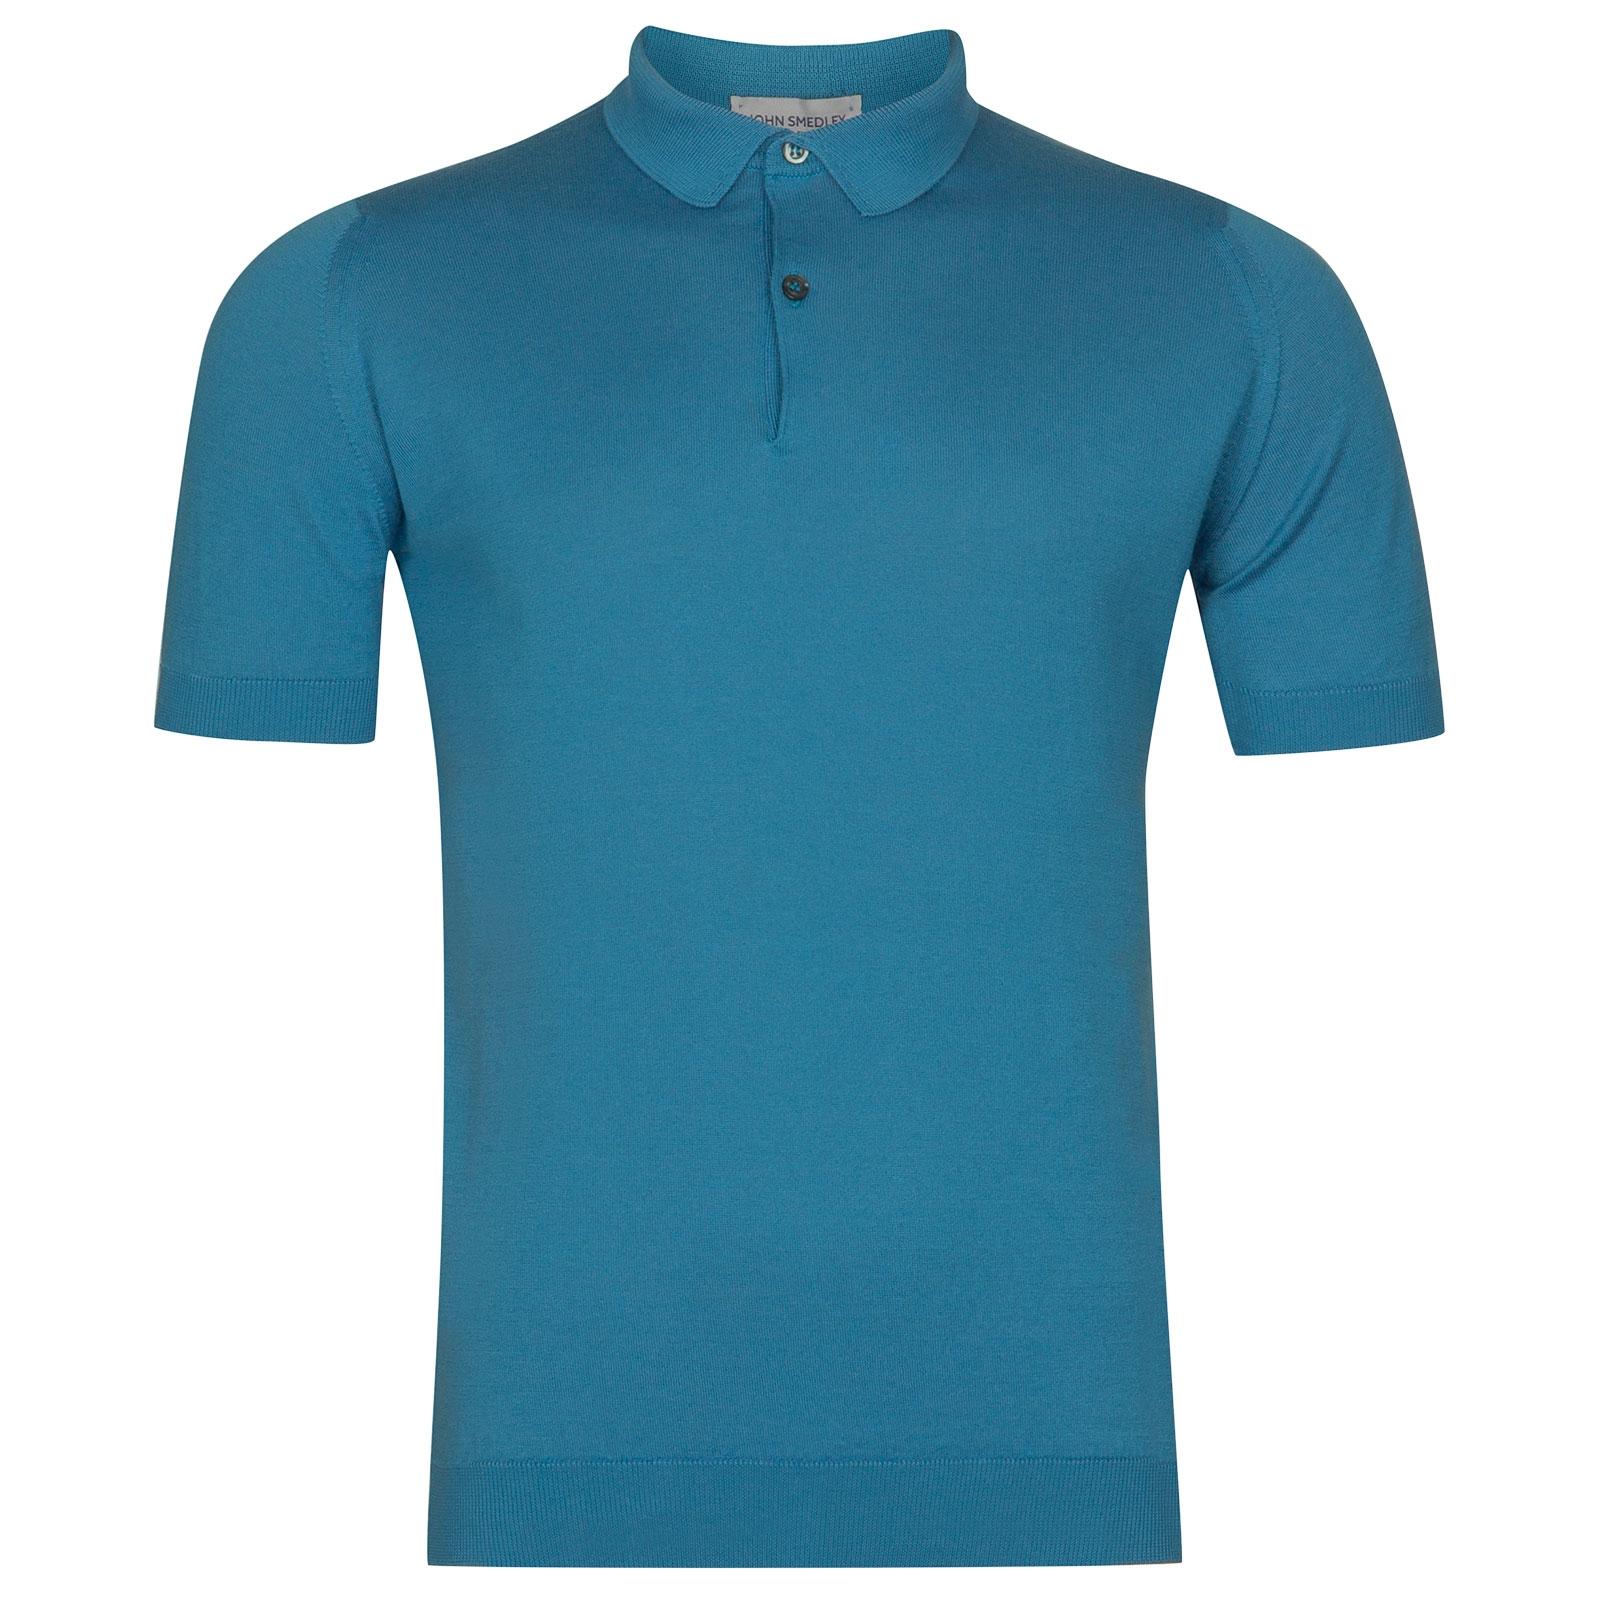 John Smedley Rhodes Sea Island Cotton Shirt in Ionize Blue-M